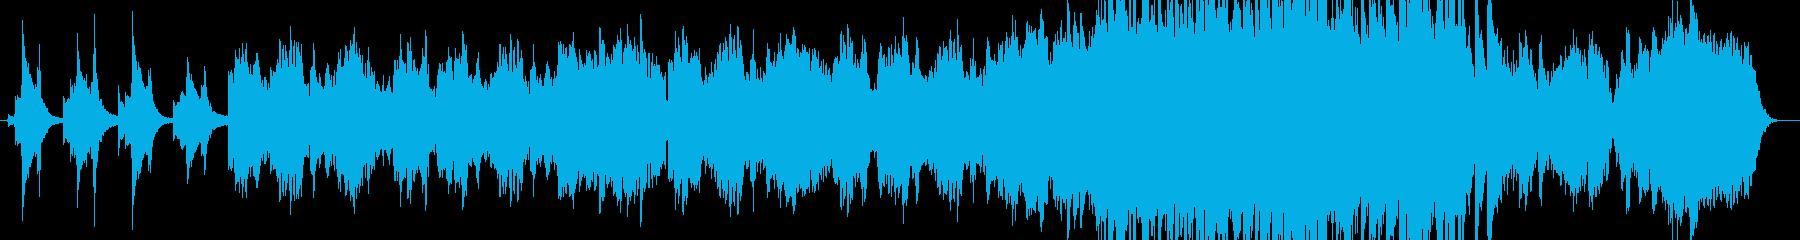 FF6のティナのテーマの様なイメージの再生済みの波形